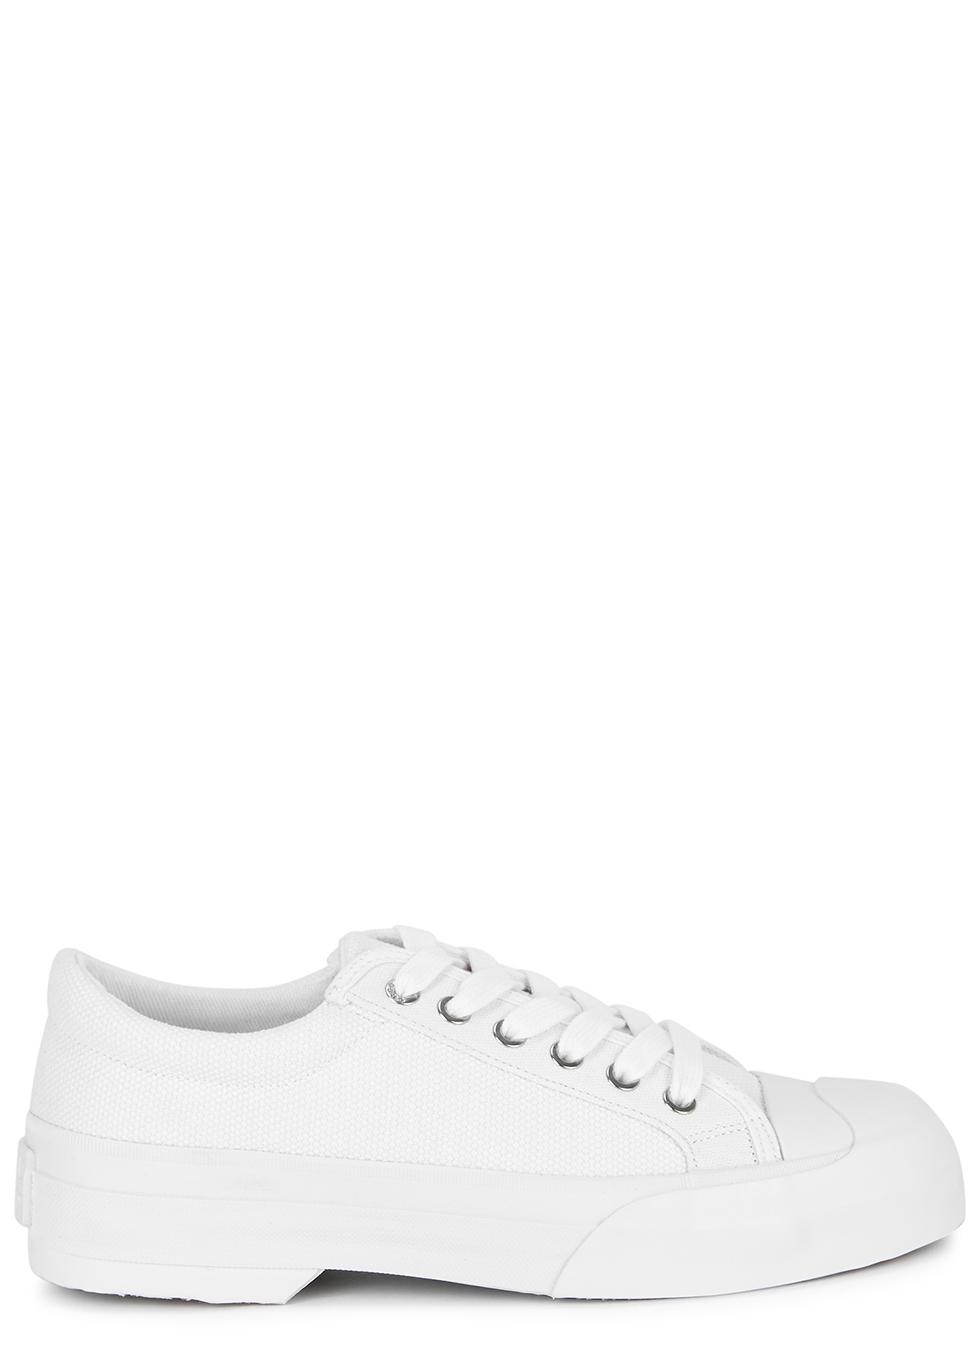 Good News Sunn white canvas sneakers